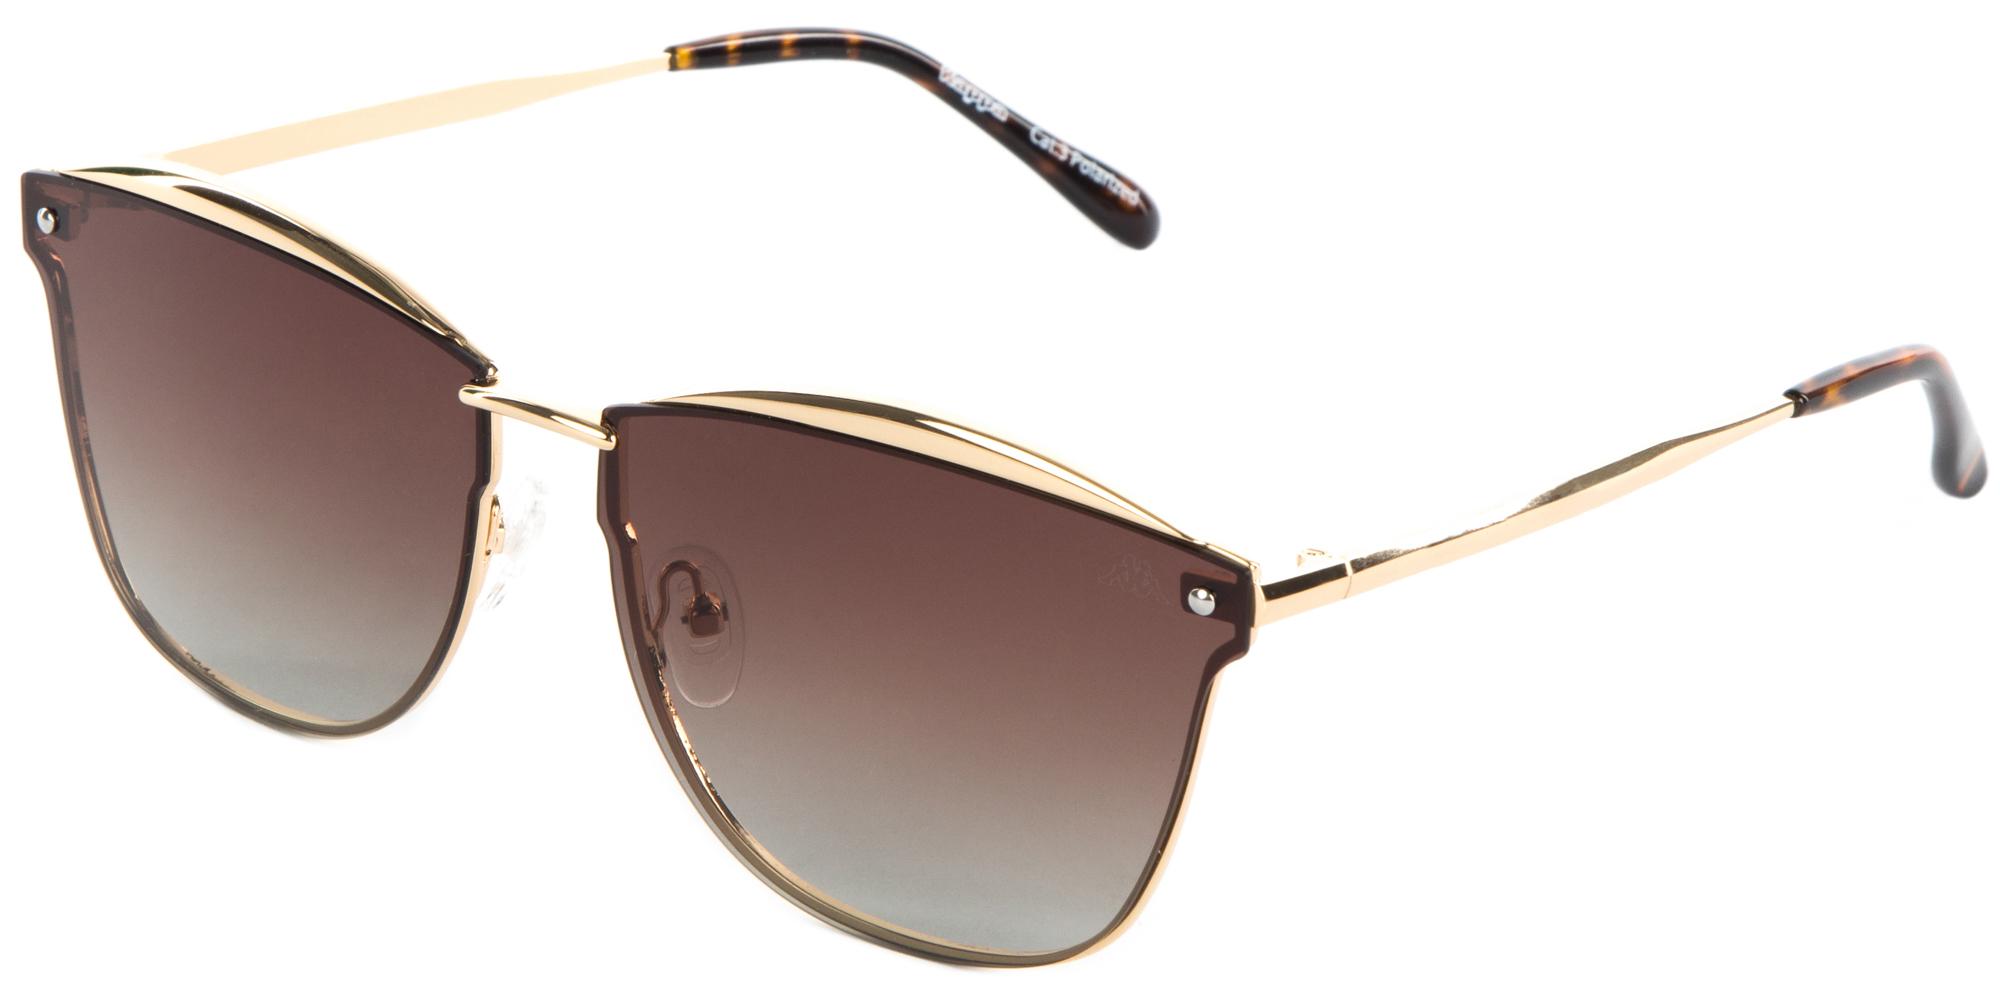 Kappa Очки солнцезащитные Kappa очки солнцезащитные jack